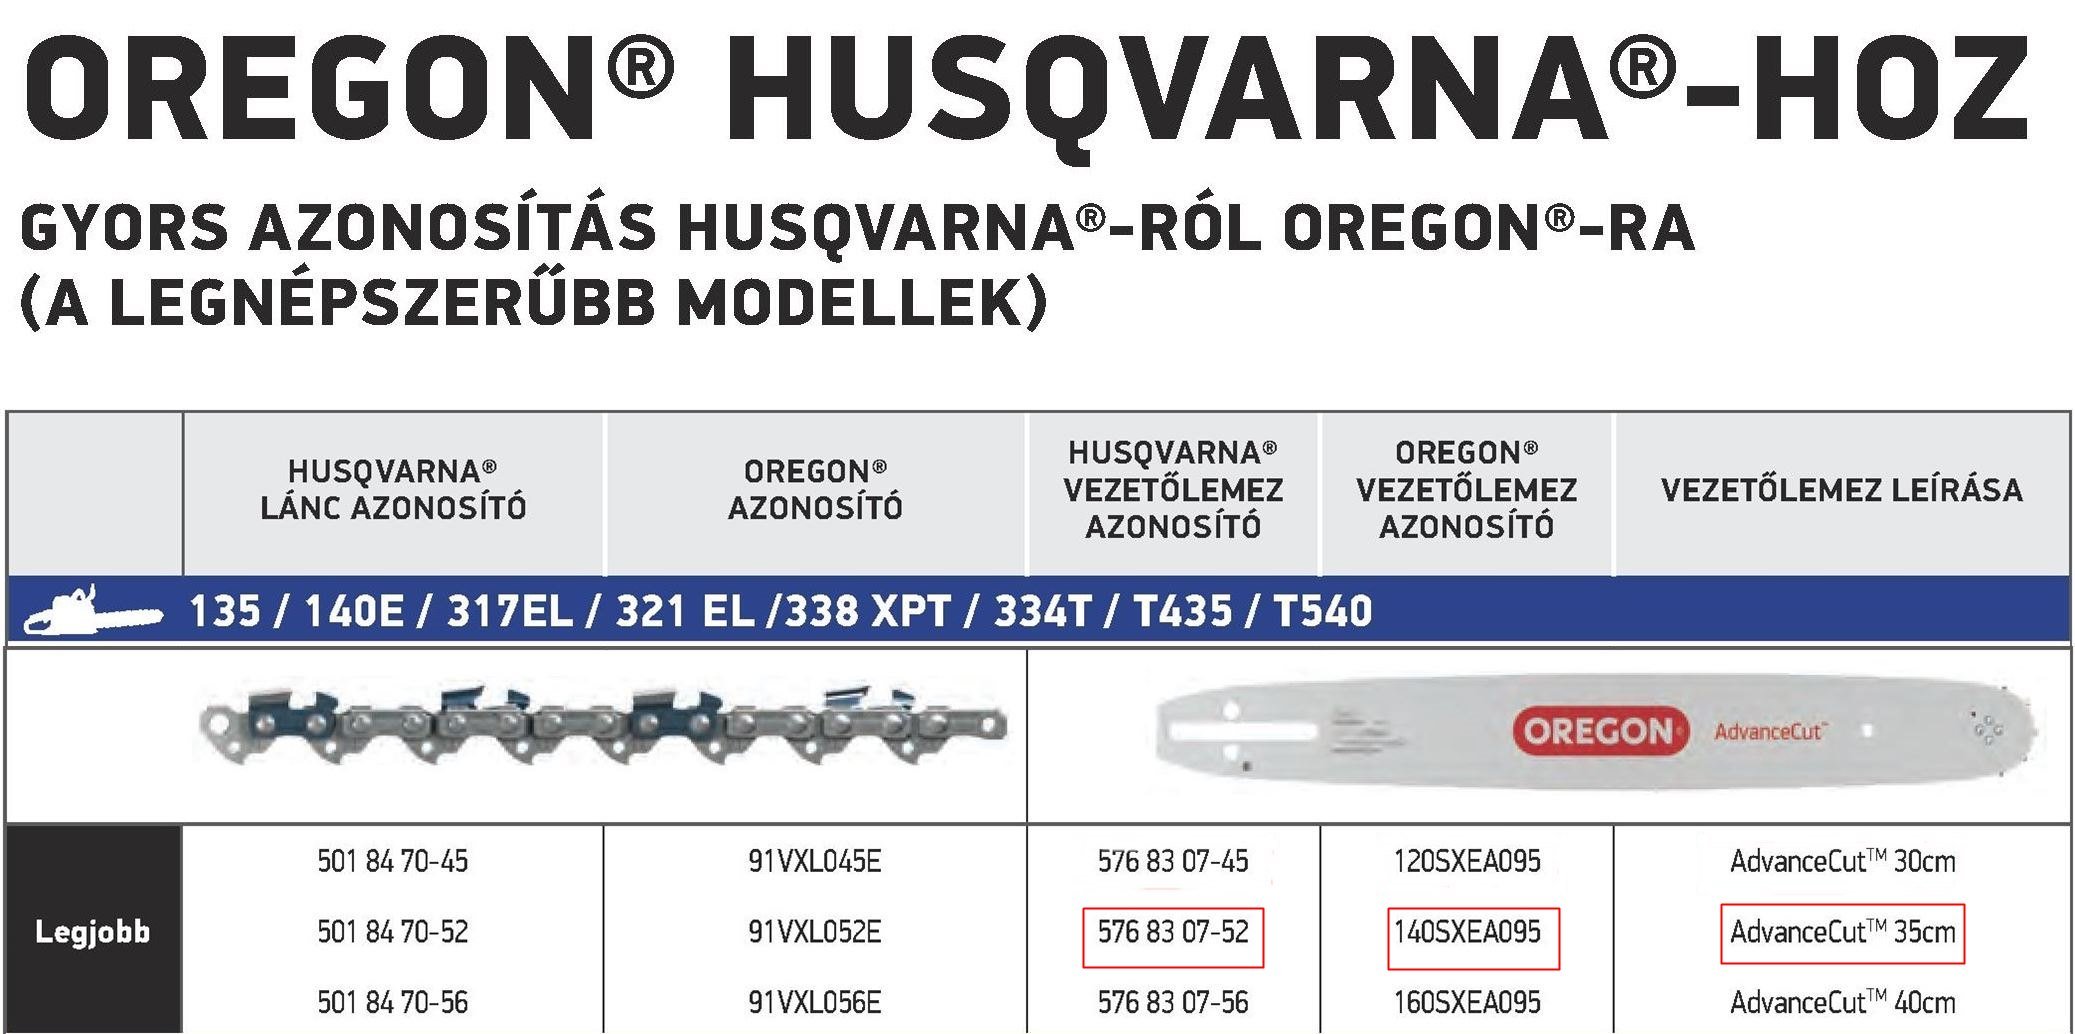 Husqvarna-576830752-Oregon-140SXEA095 vezető